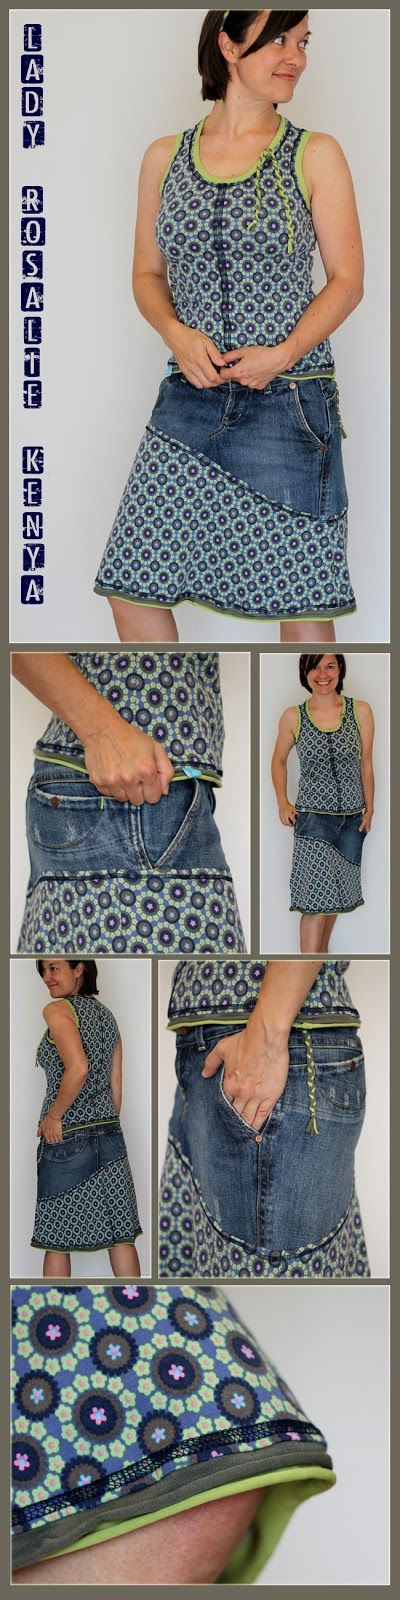 385 best Nähen - Kleidung images on Pinterest